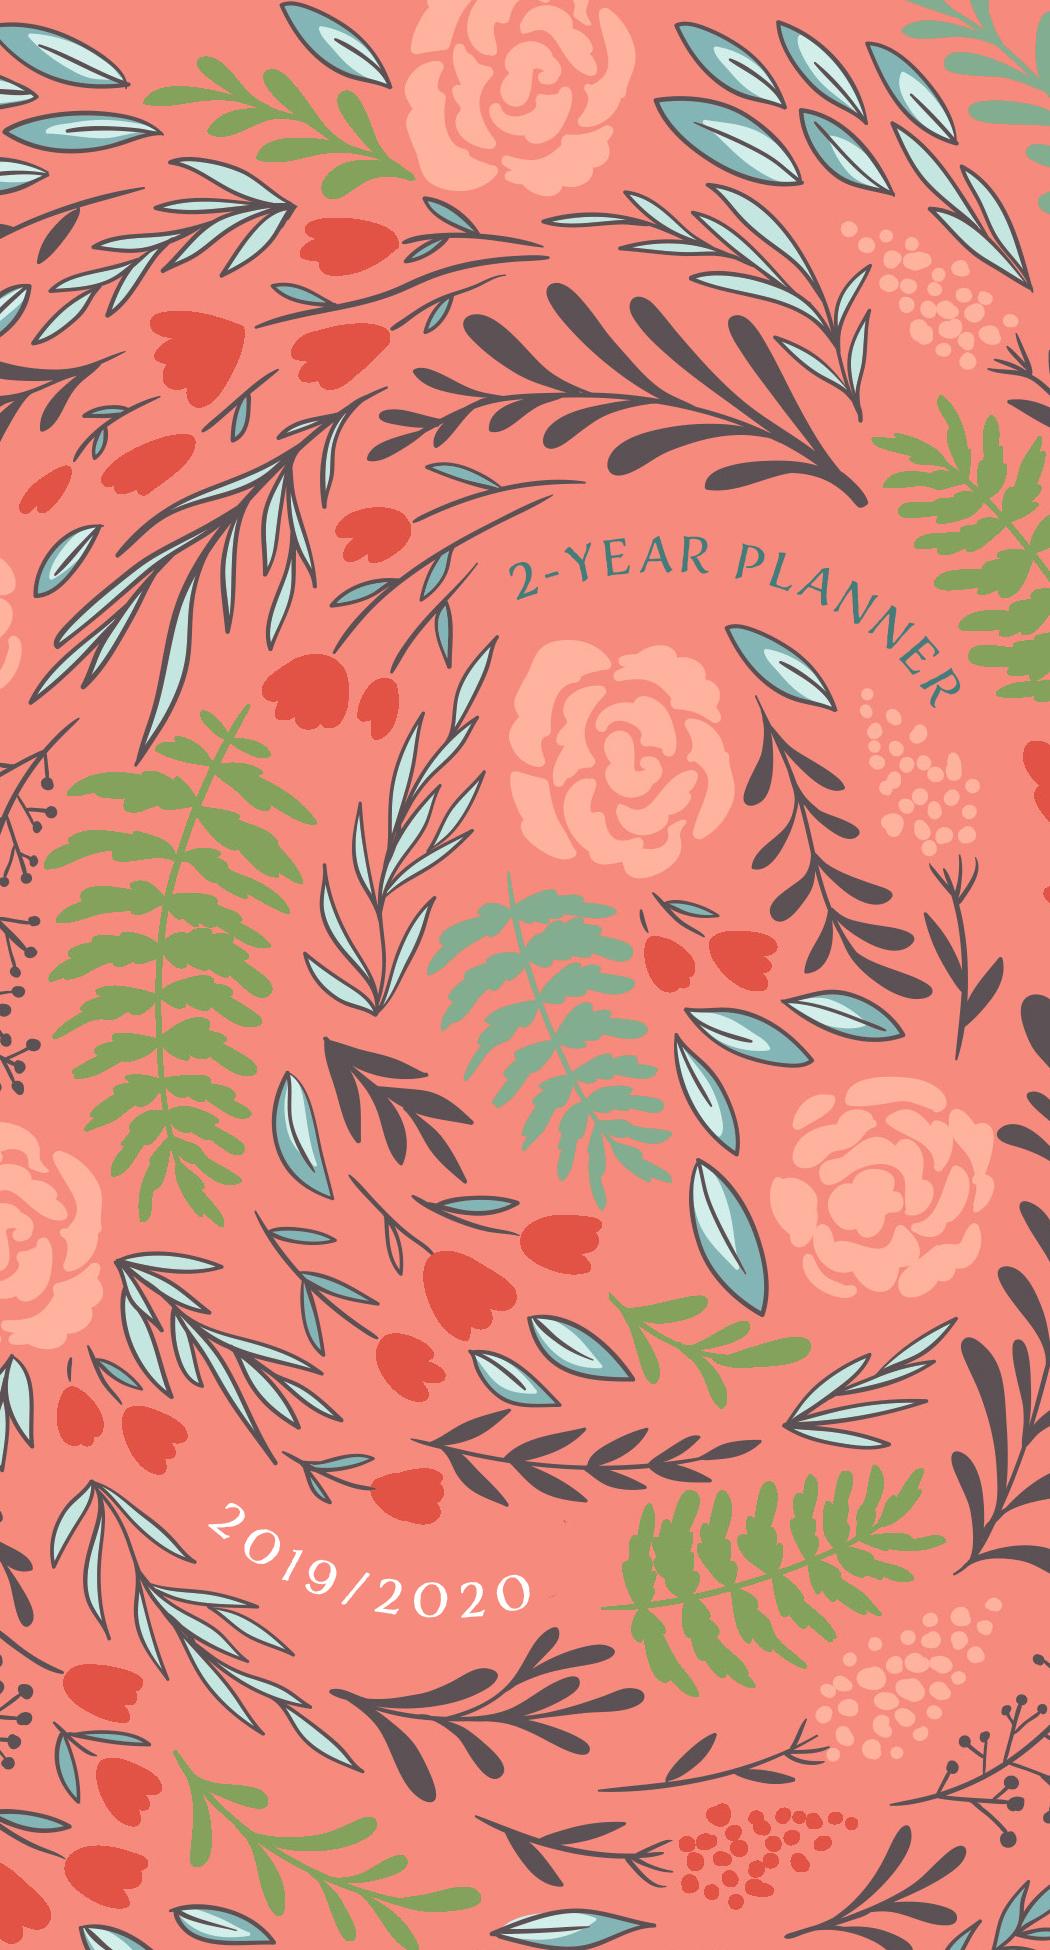 Coral Floral 2019/2020 Planner: 2-Year Pocket Planner